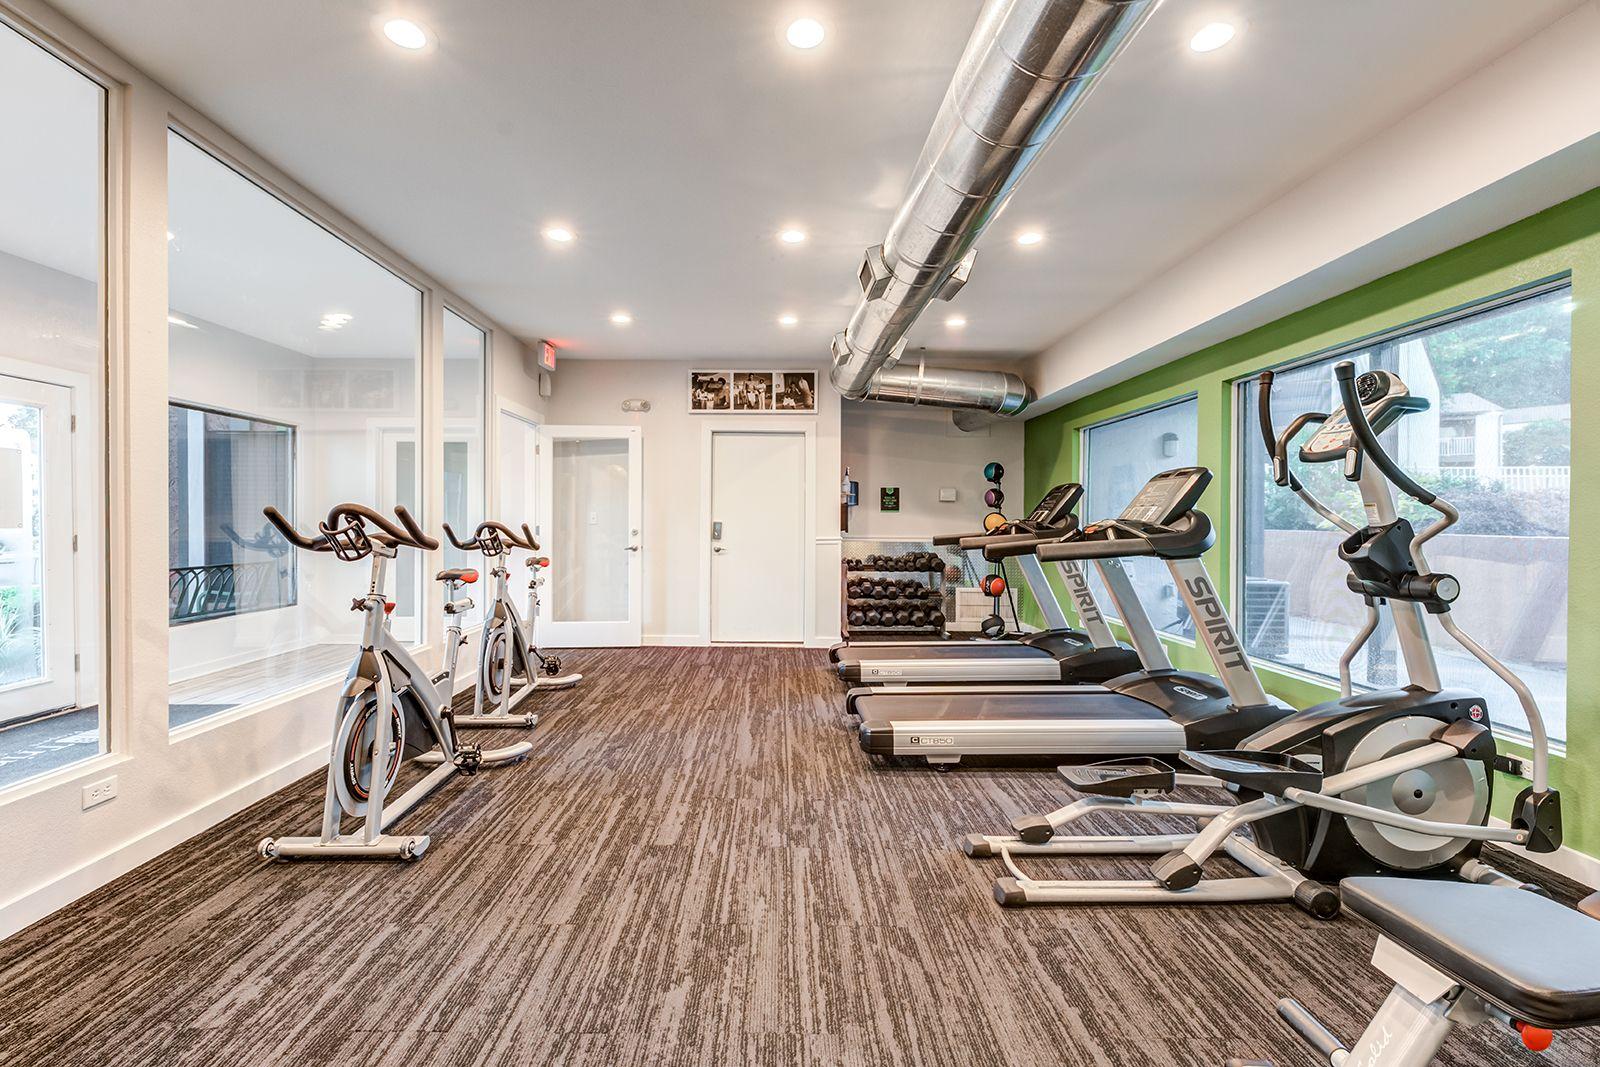 Break a sweat in our fitness center. Amenities